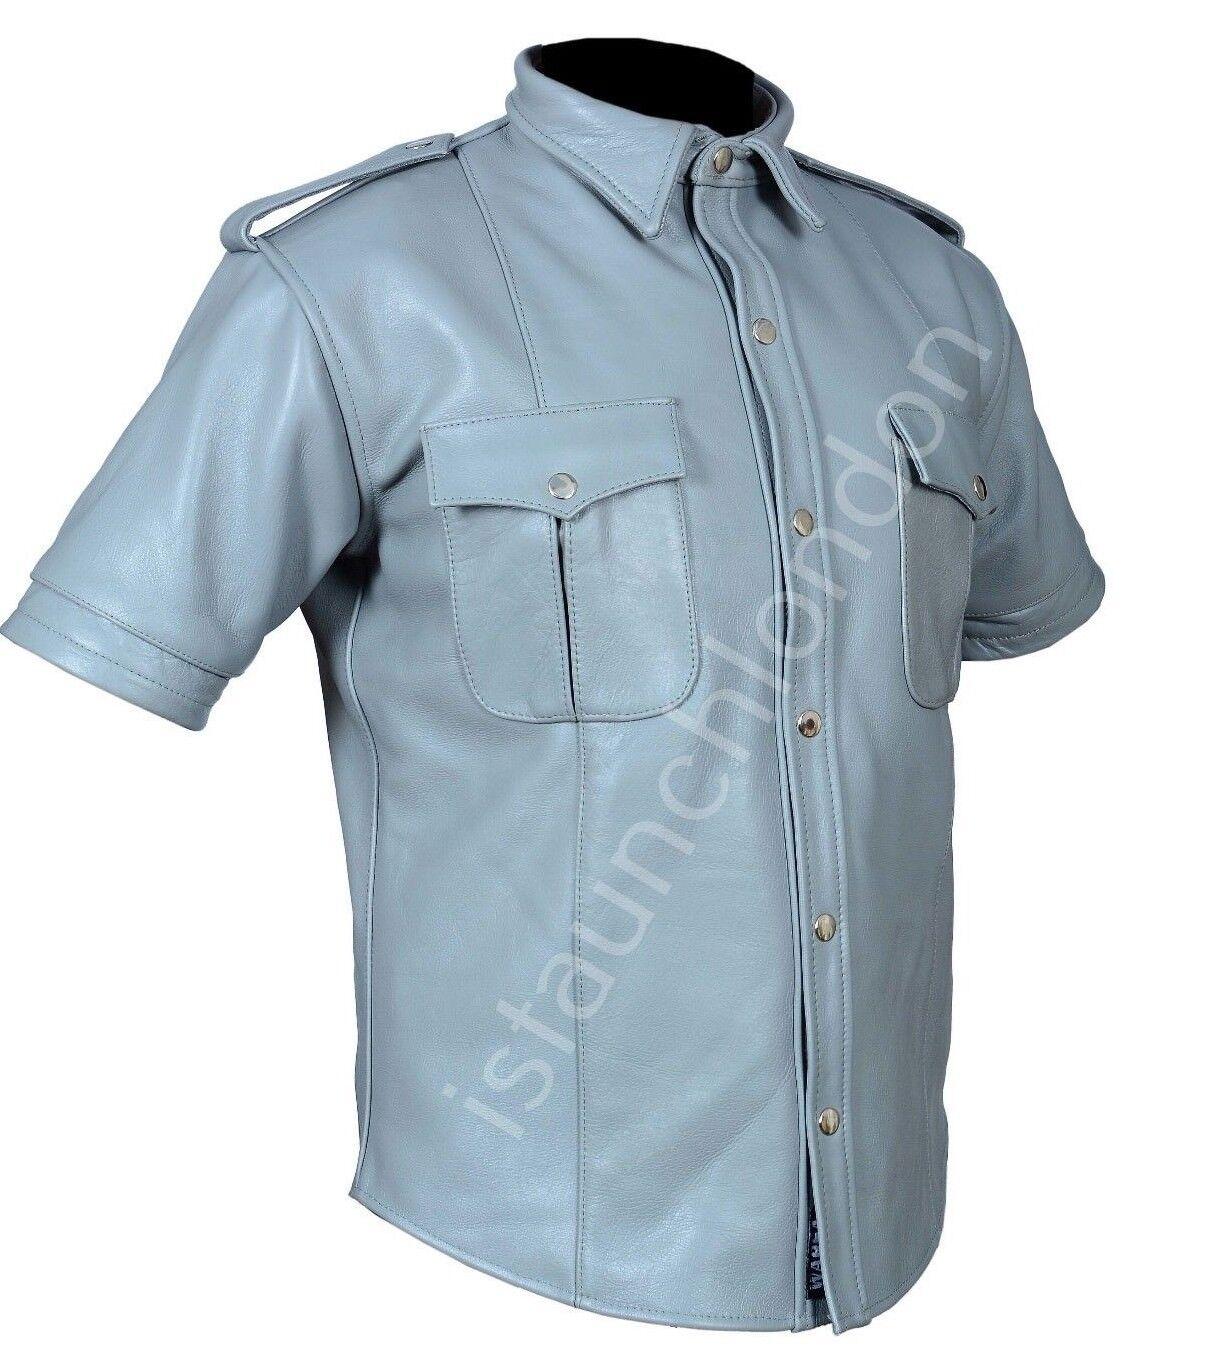 PREMIUM Men Hot Genuine Real Grey Cowhide LEATHER Police Uniform Shirt blueF Gay